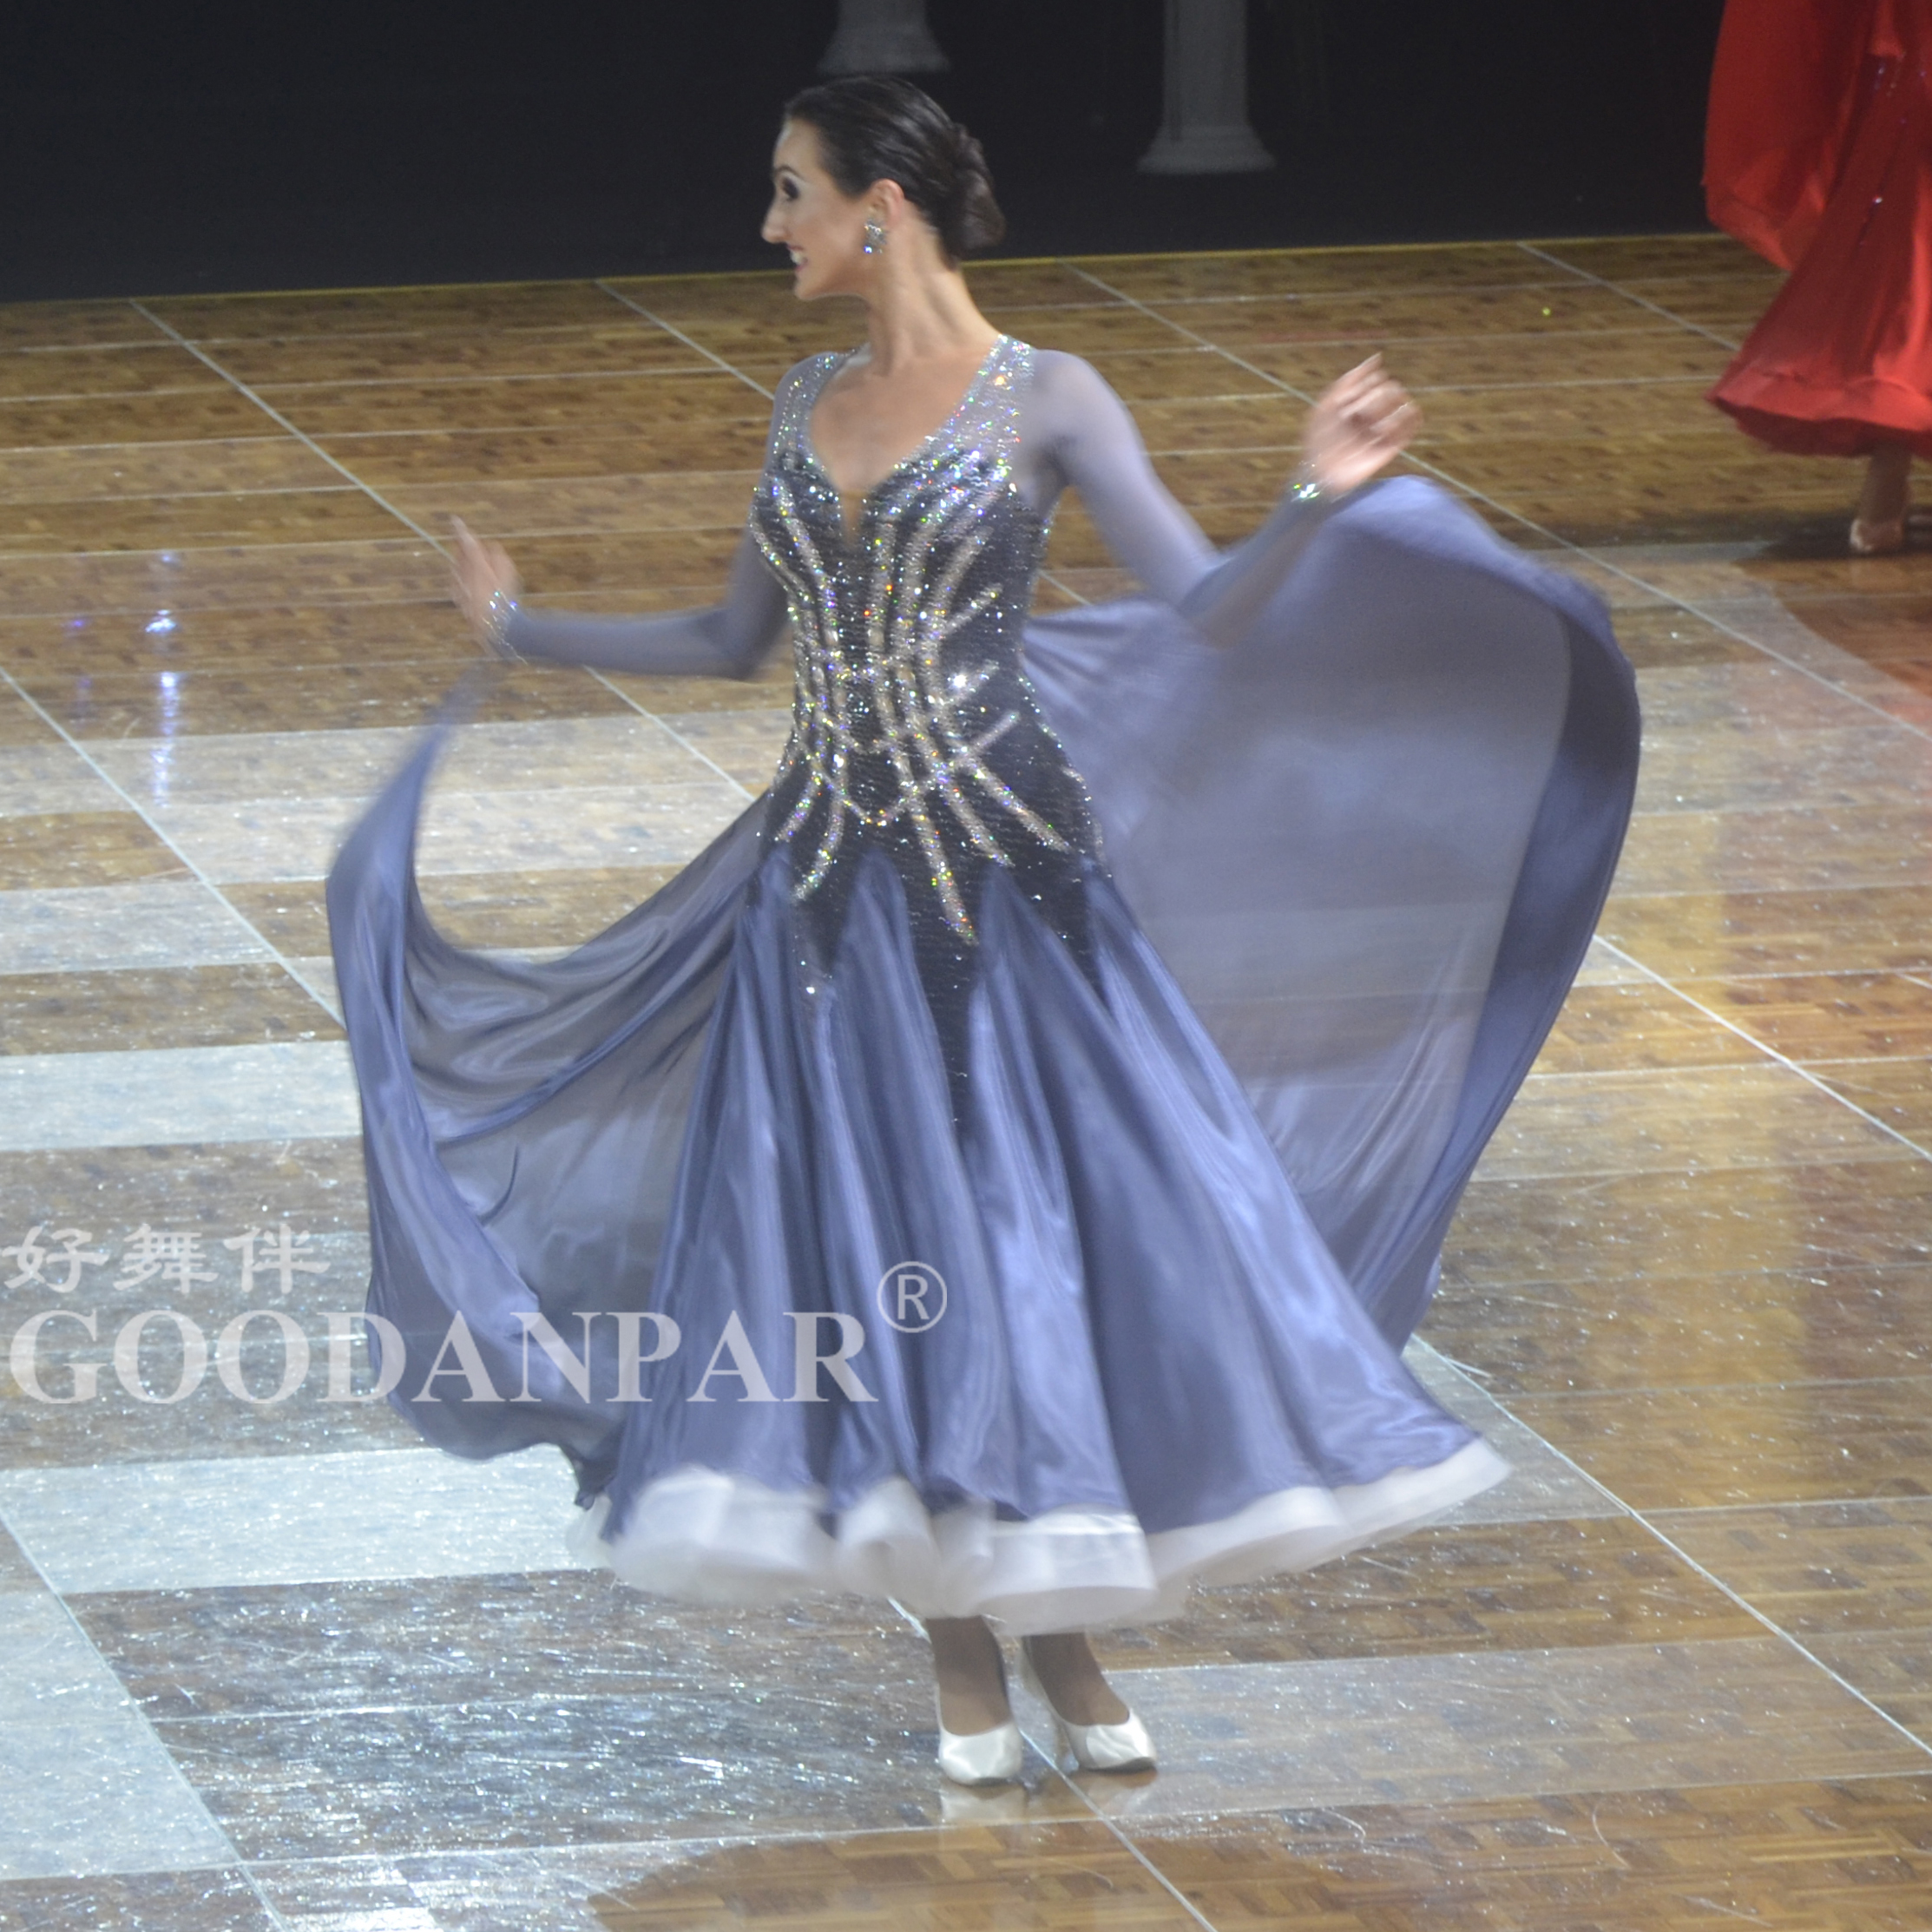 GOODANPAR Ballroom Dance Dresses Ladies Women Girls Fine Stones Long Sleeve Stage Dance Wear Waltz Flamenco Ballroom Dress Gray